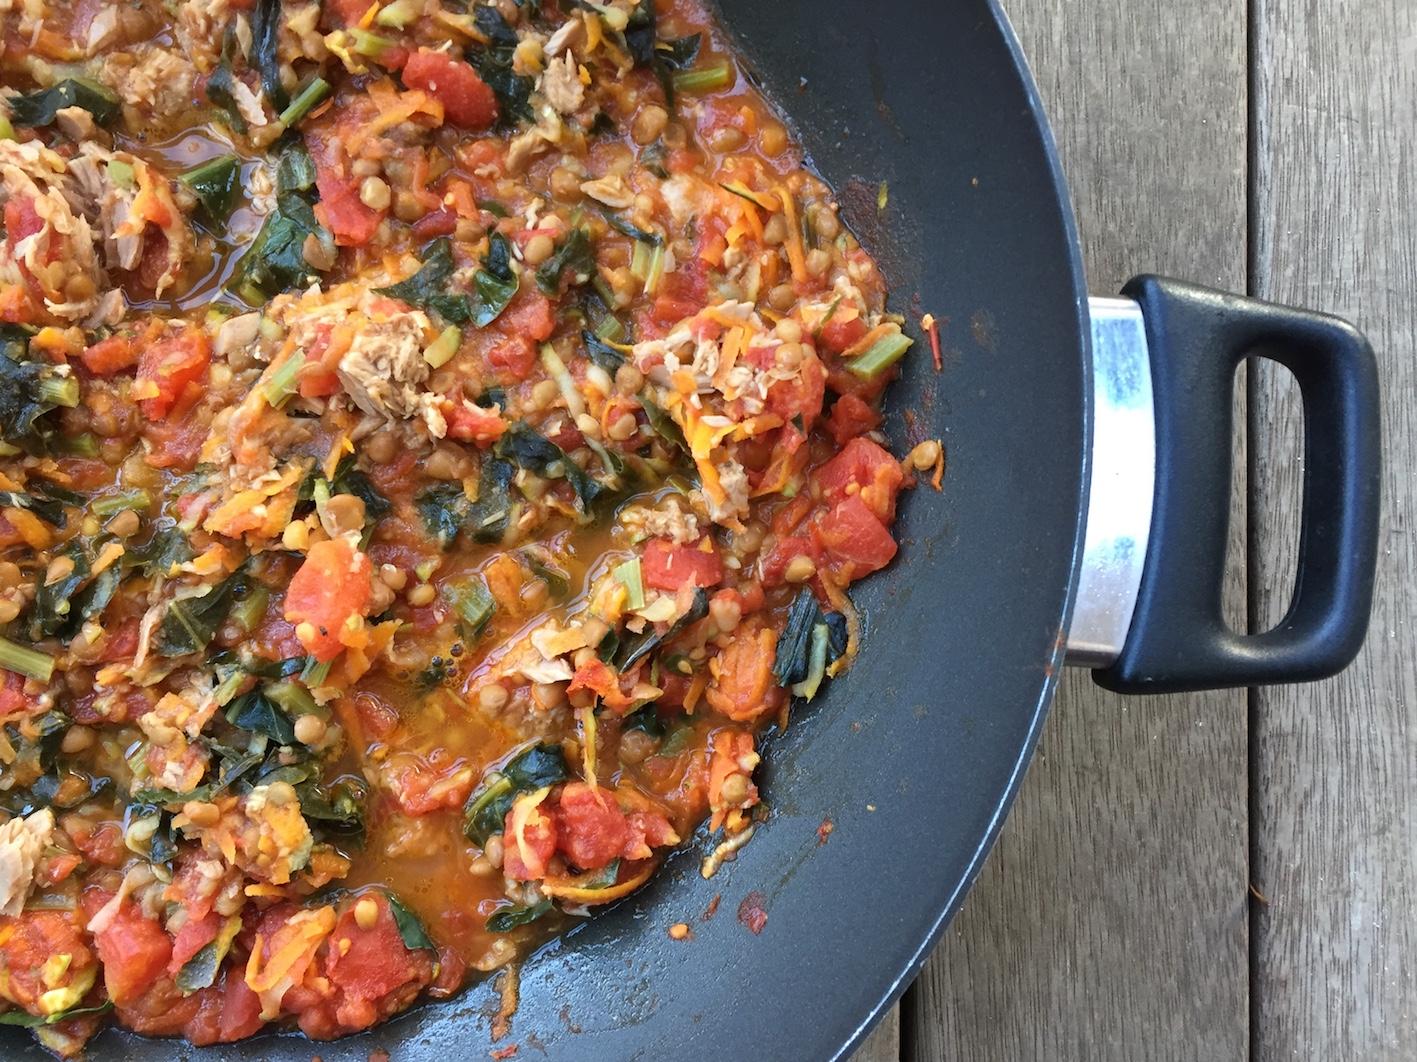 The pasta sauce